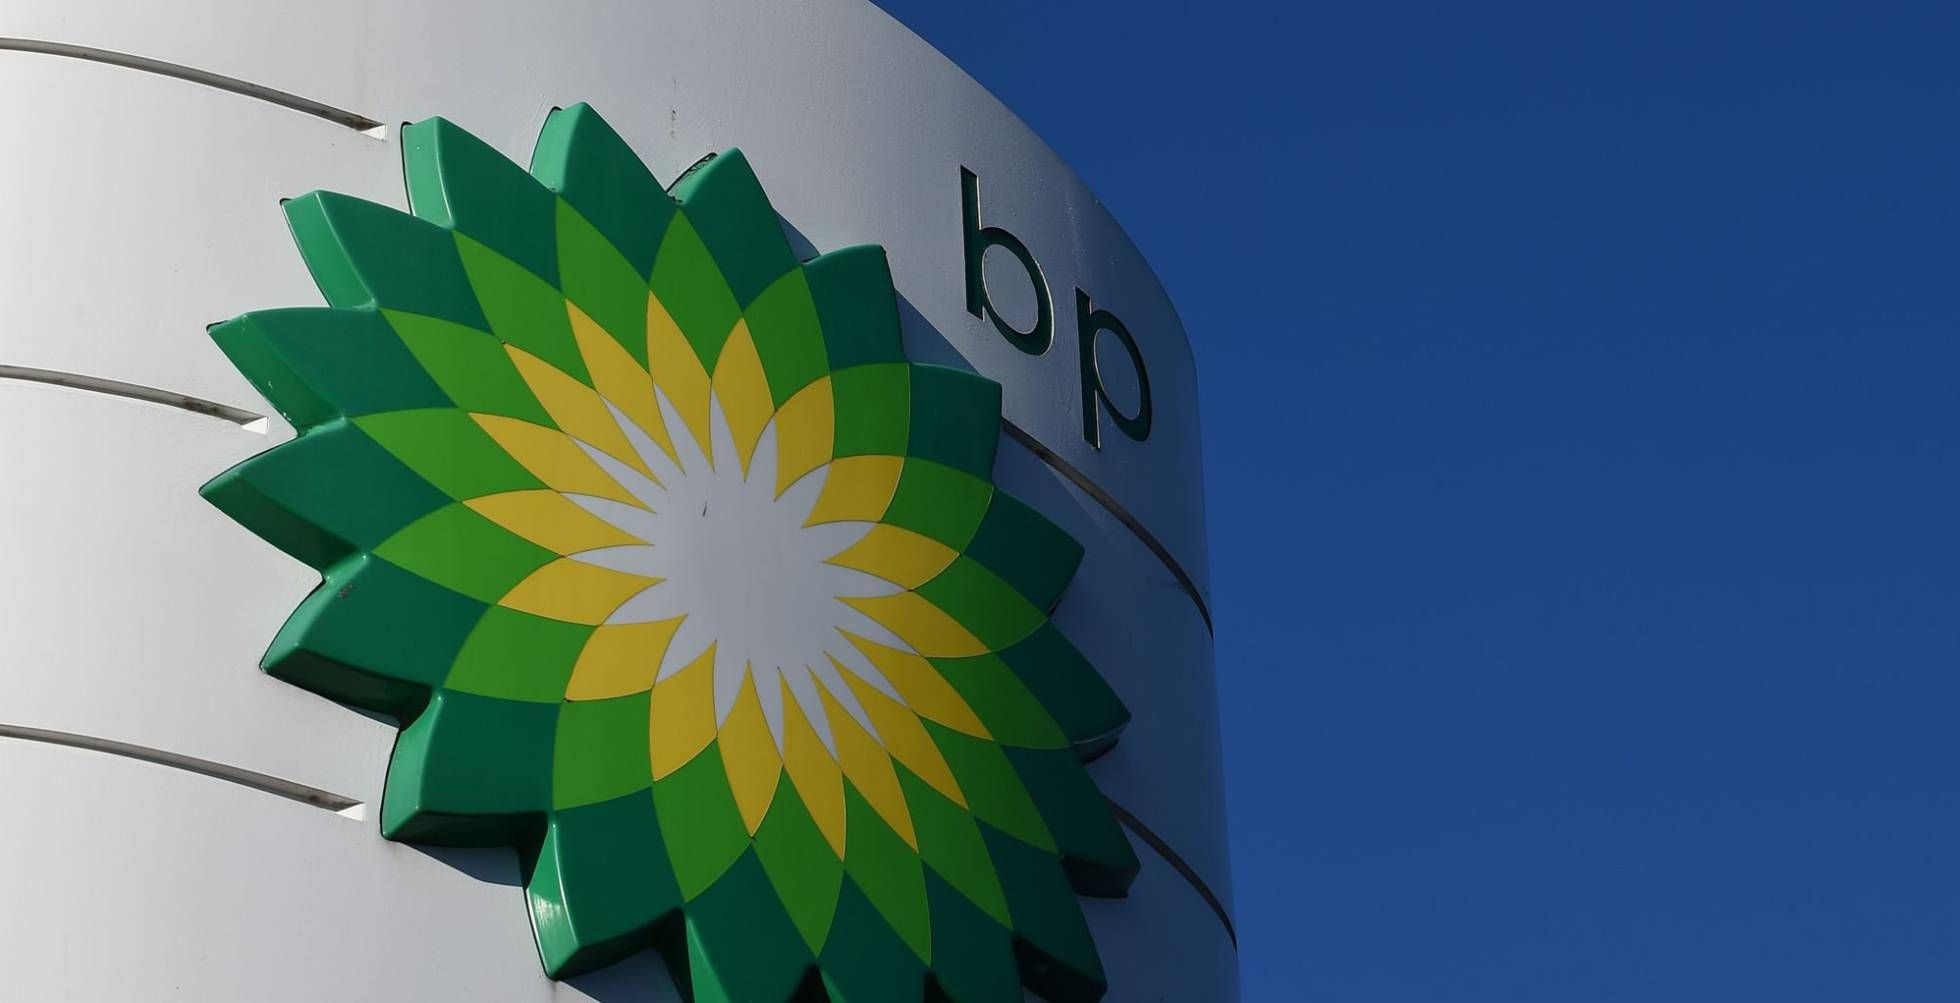 Lightsource BP consolida su presencia en España con la adquisición de 1GW a Ric Energy